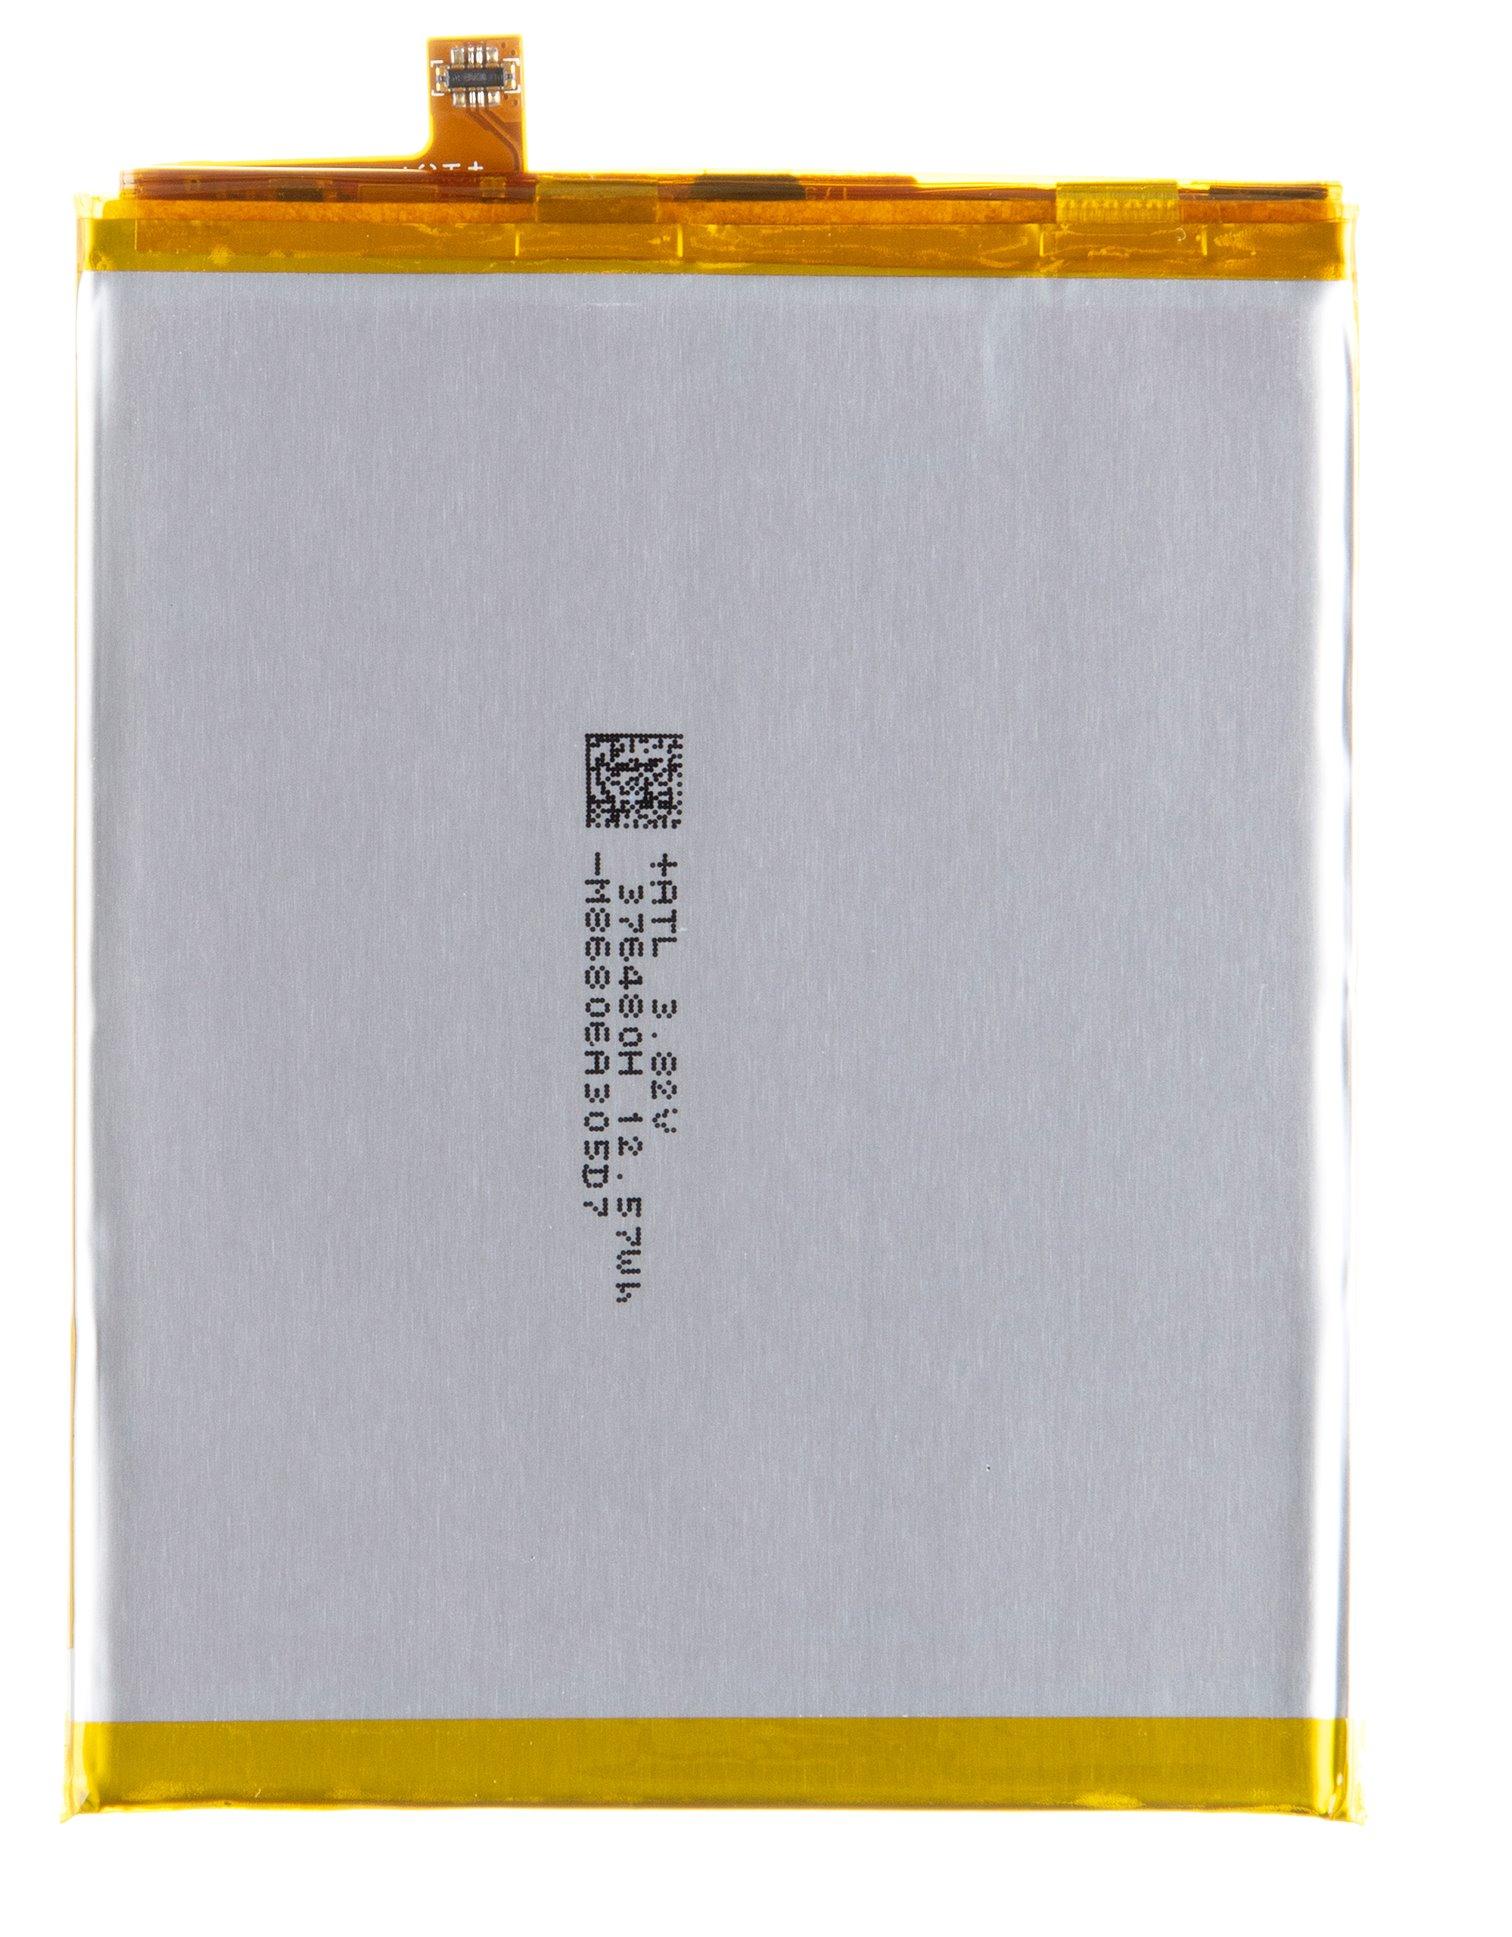 HB386483ECW Huawei Baterie 3270mAh Li-Pol (Service Pack)